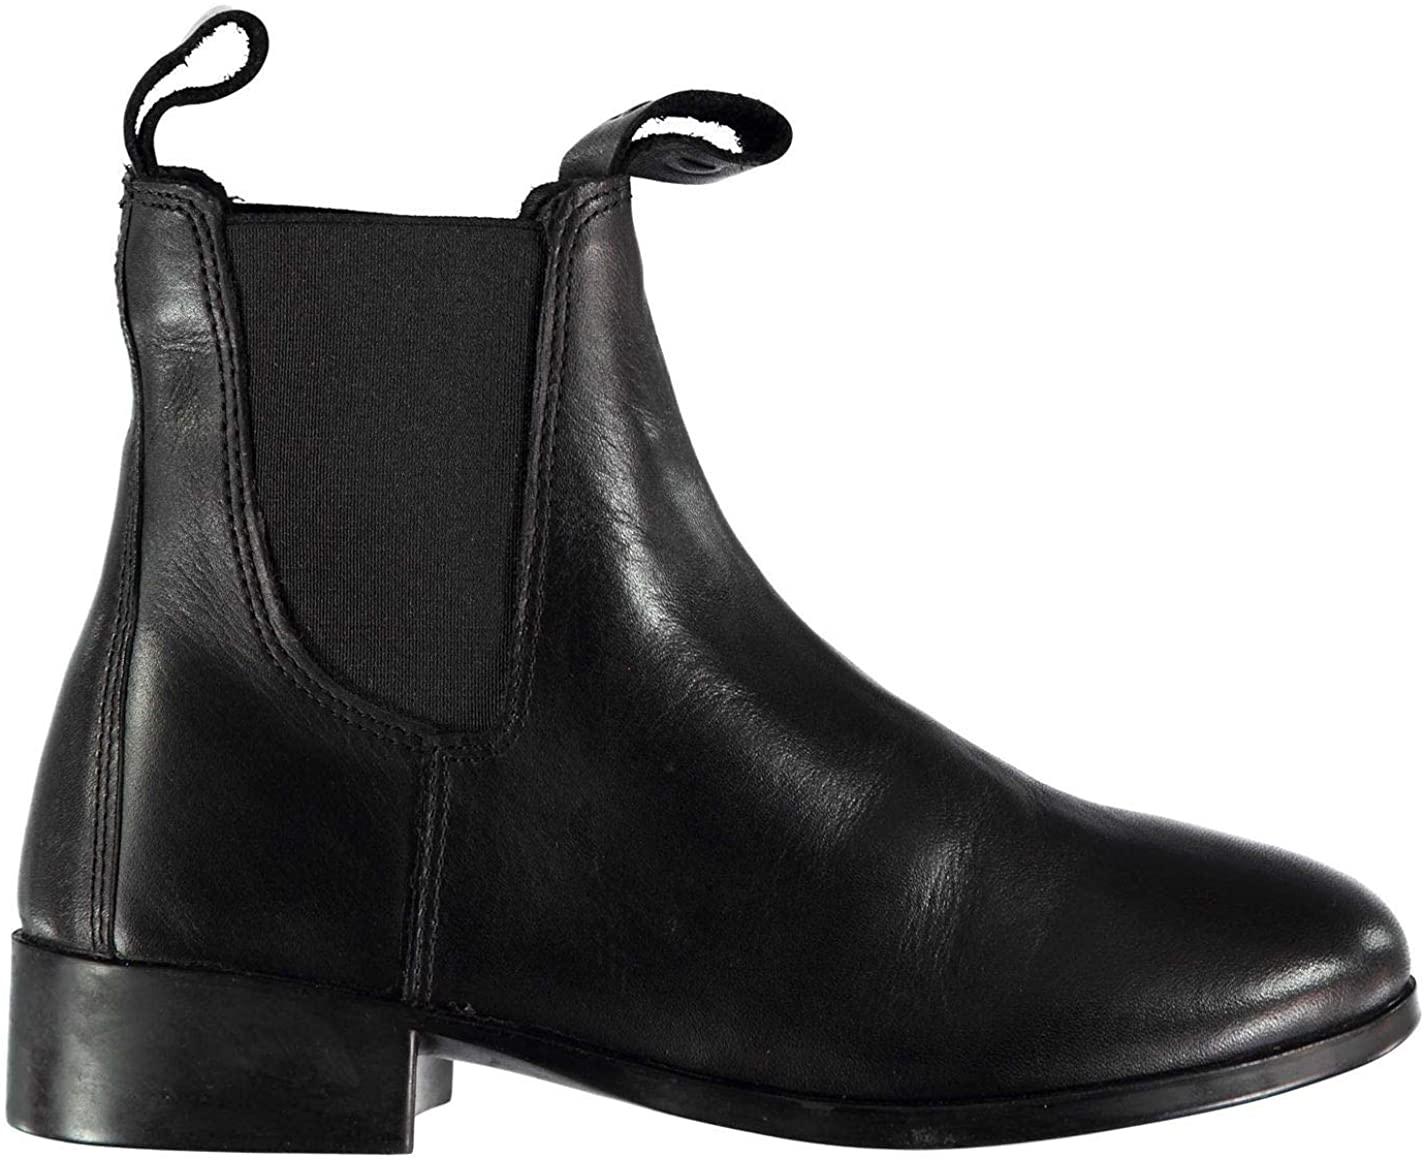 Dublin Elevation II Jodhpur Boots Juniors Boys Black Shoes Boot Kids Footwear